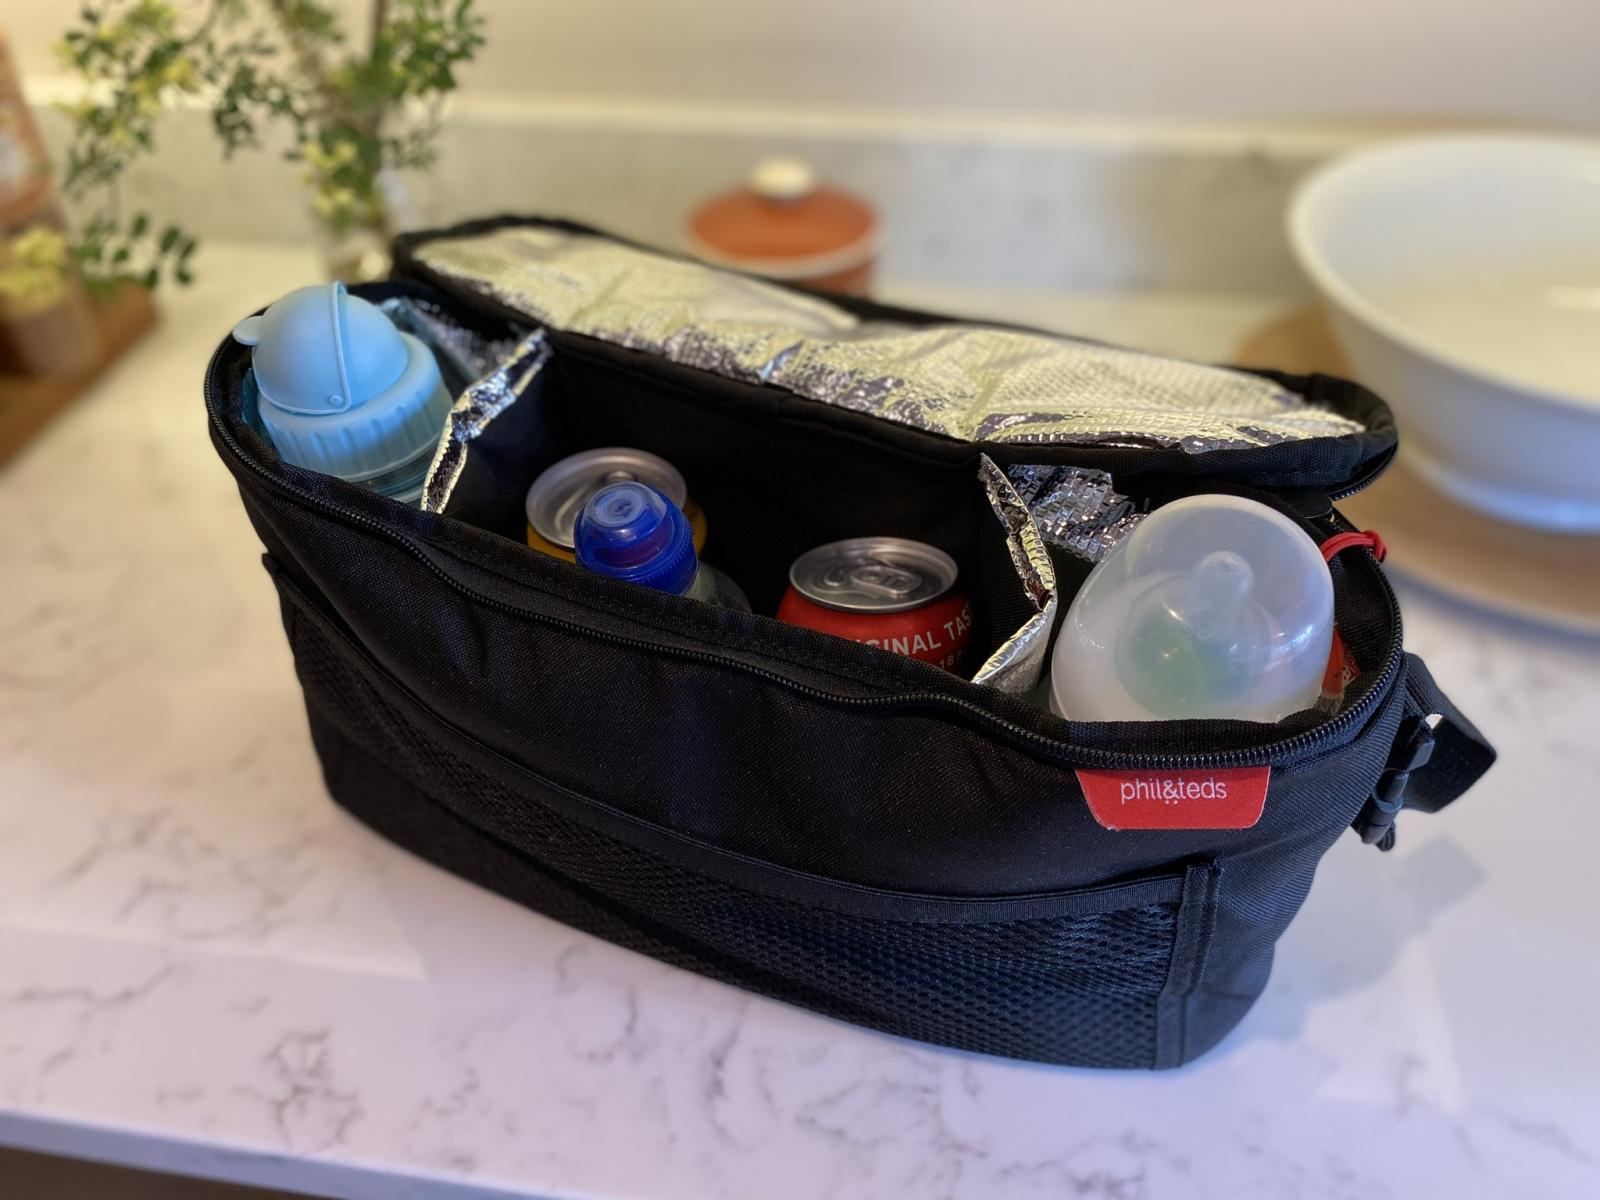 phil&teds igloo soft case